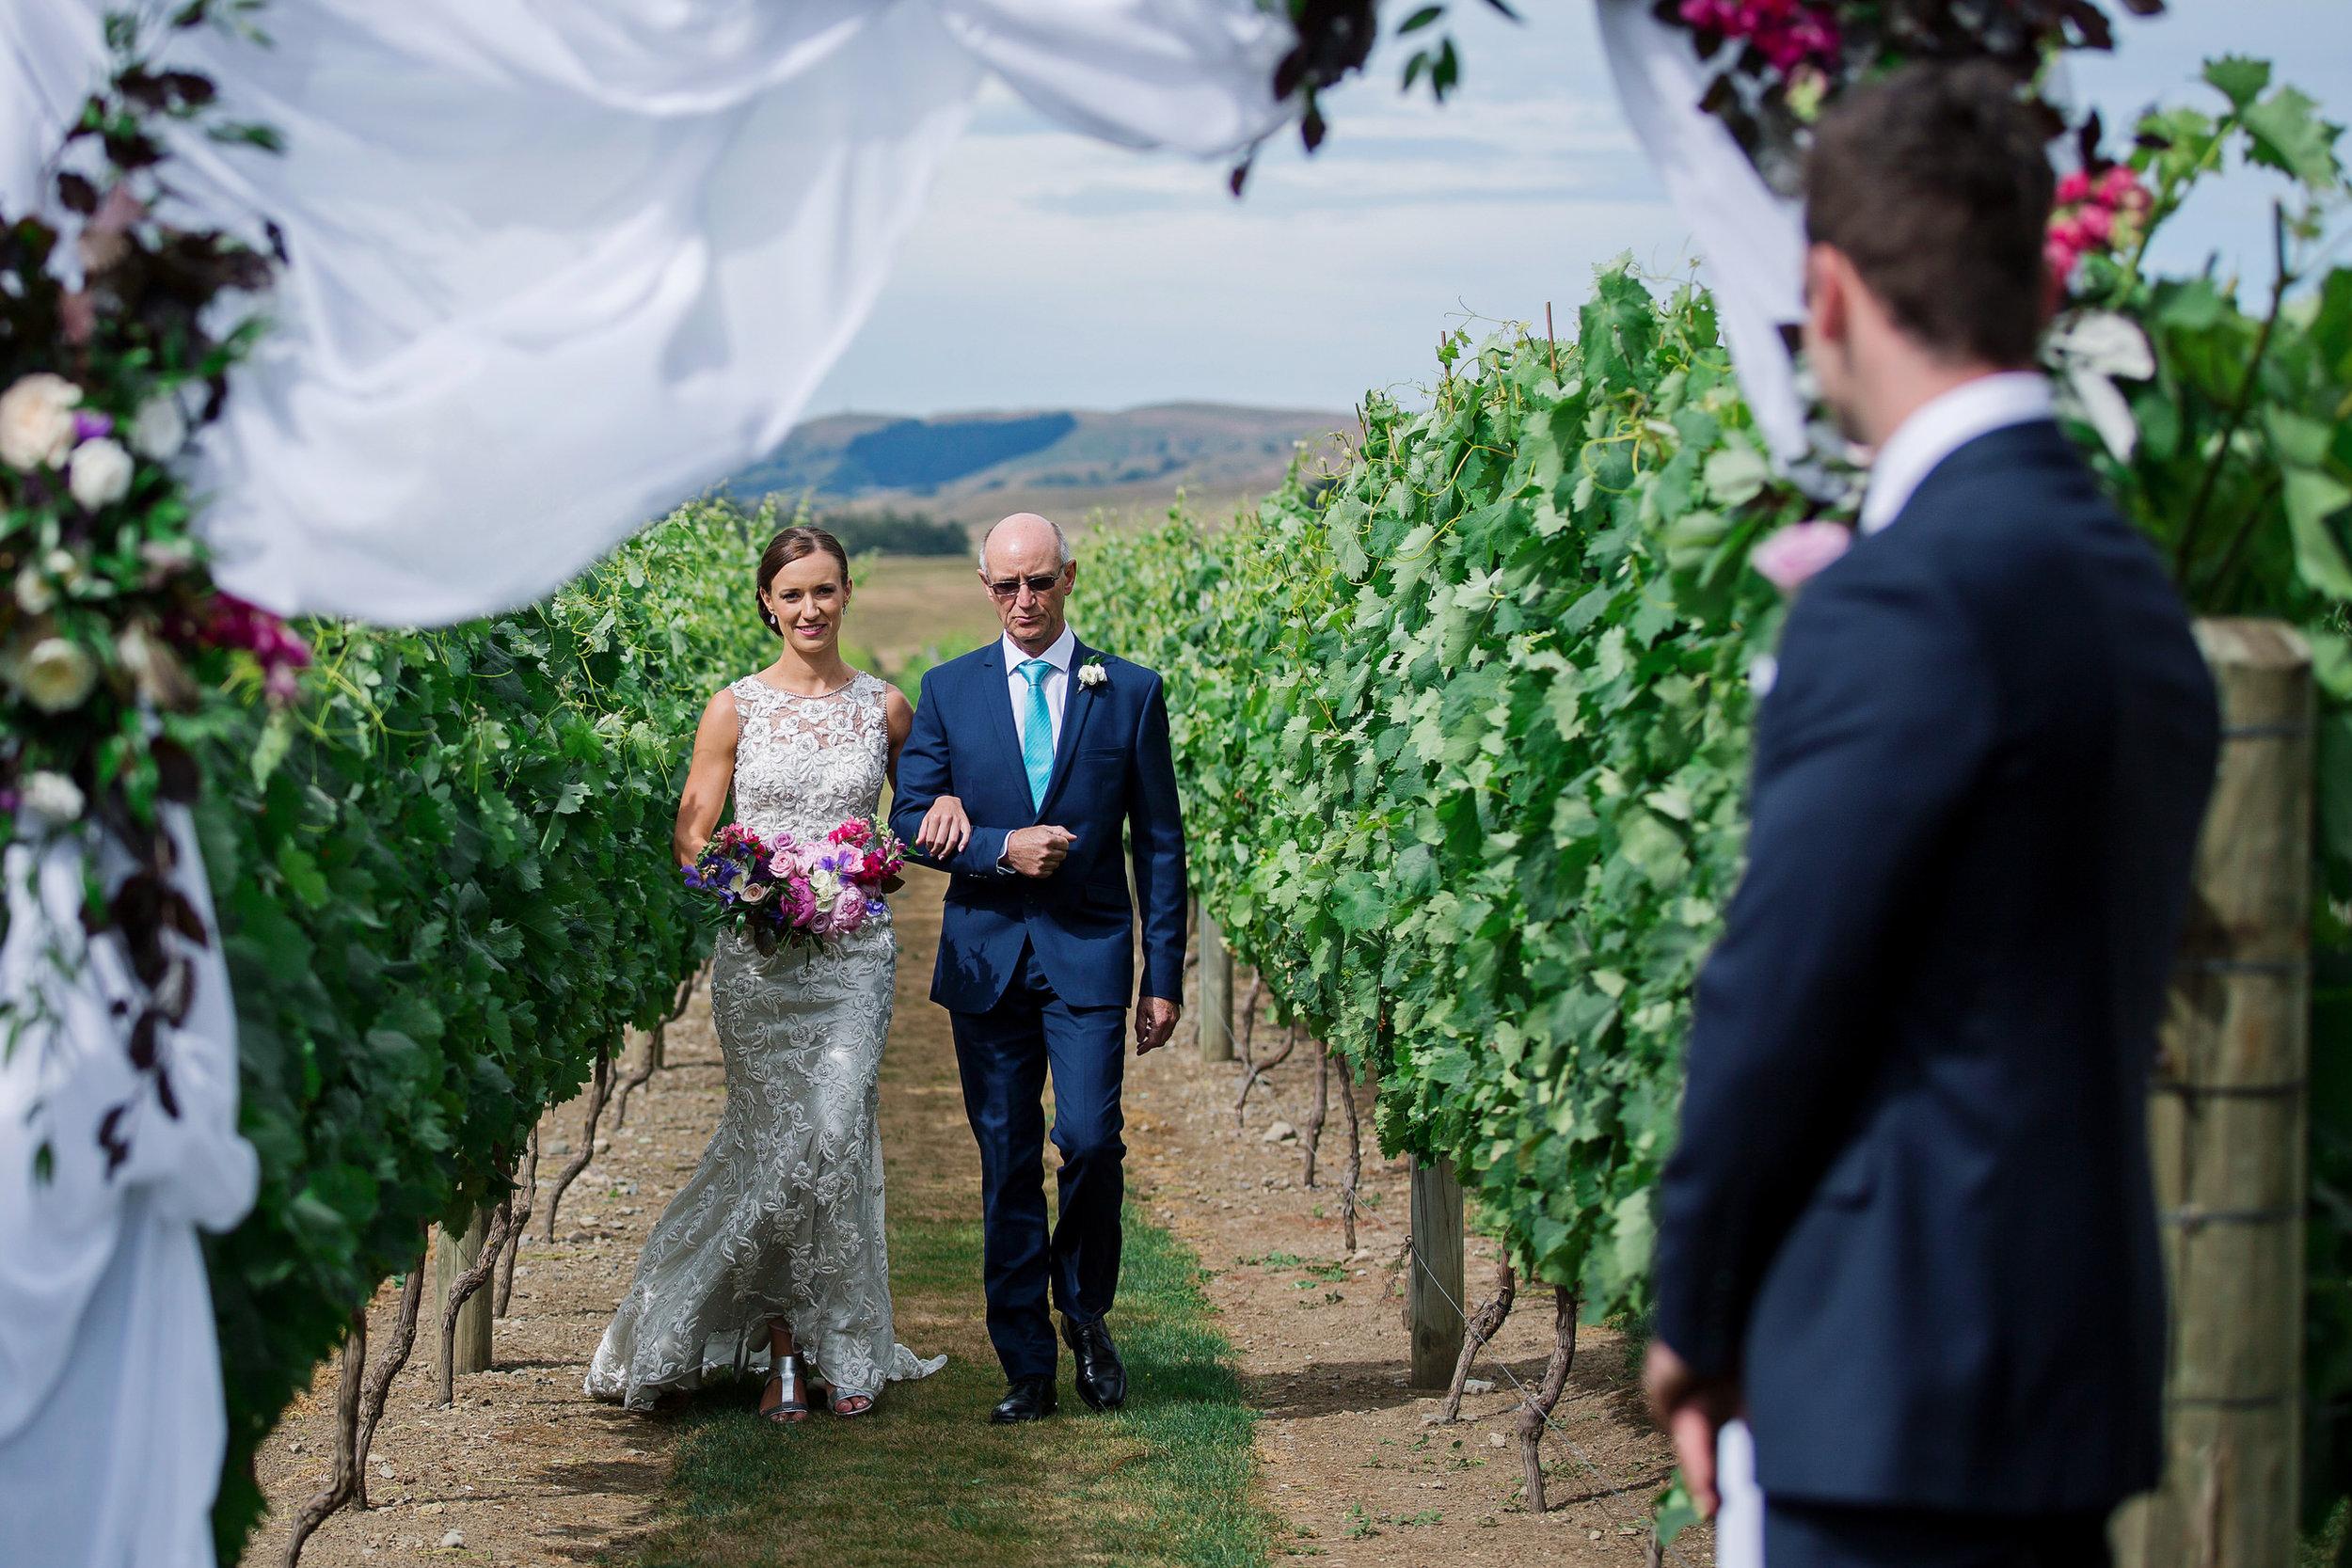 Martinborough-Poppies-Wedding-Caine-Eloise-Toni-Larsen-0077.jpg